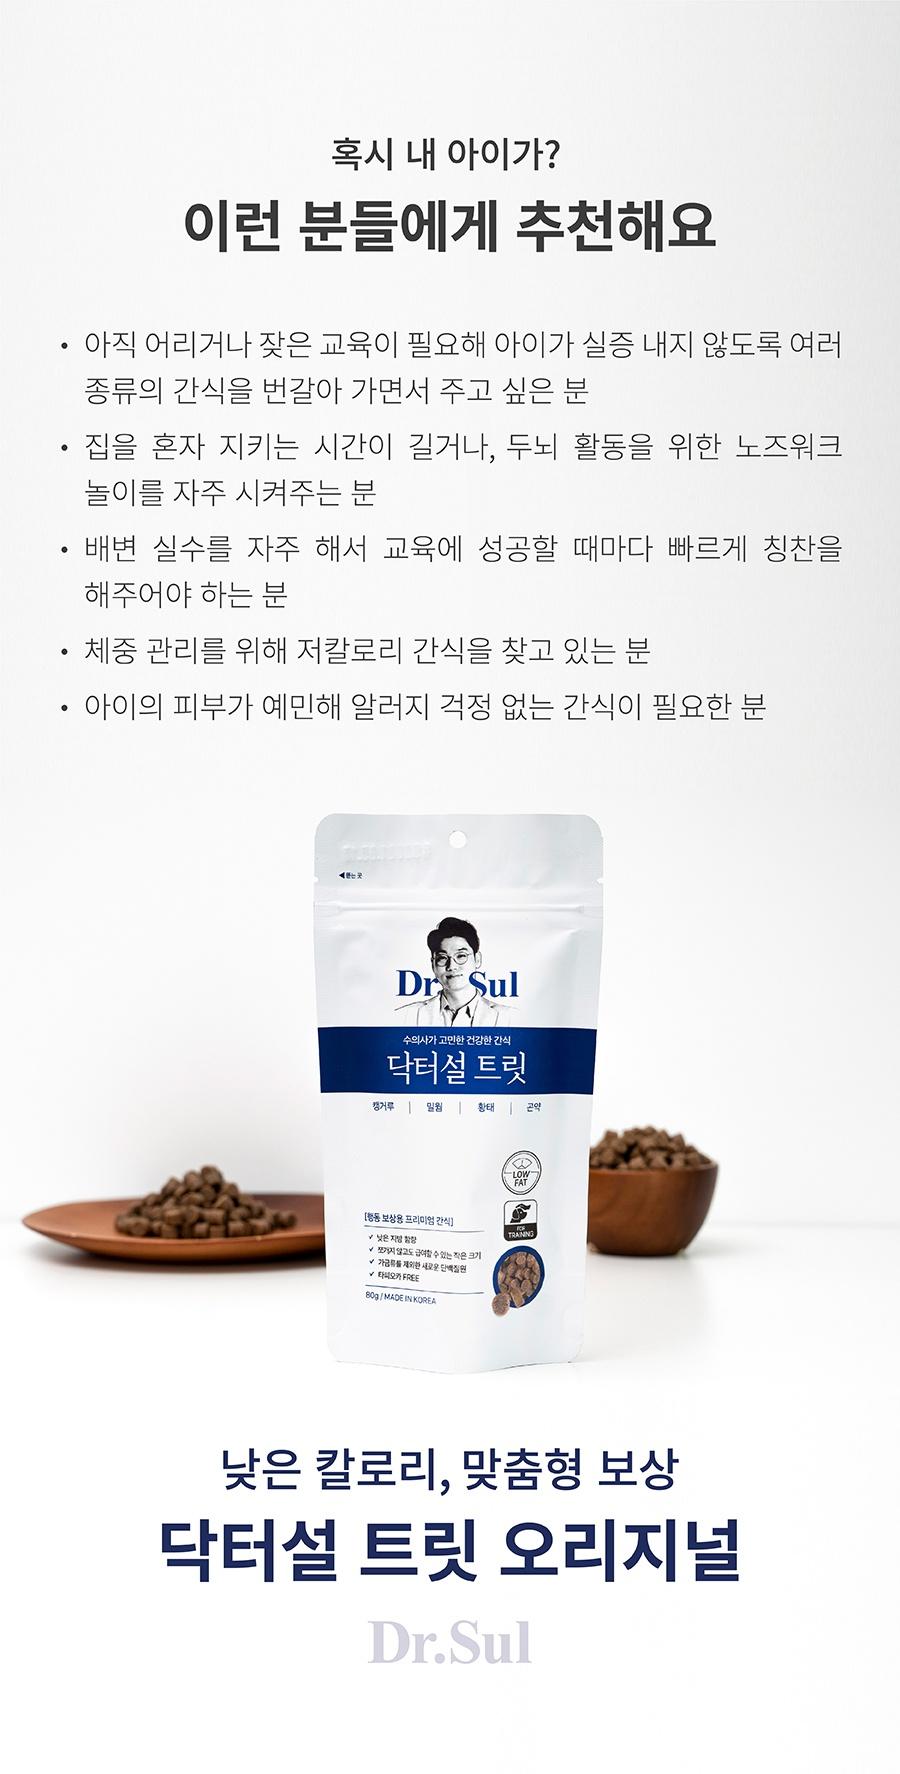 [EVENT] 닥터설 트릿-상품이미지-2